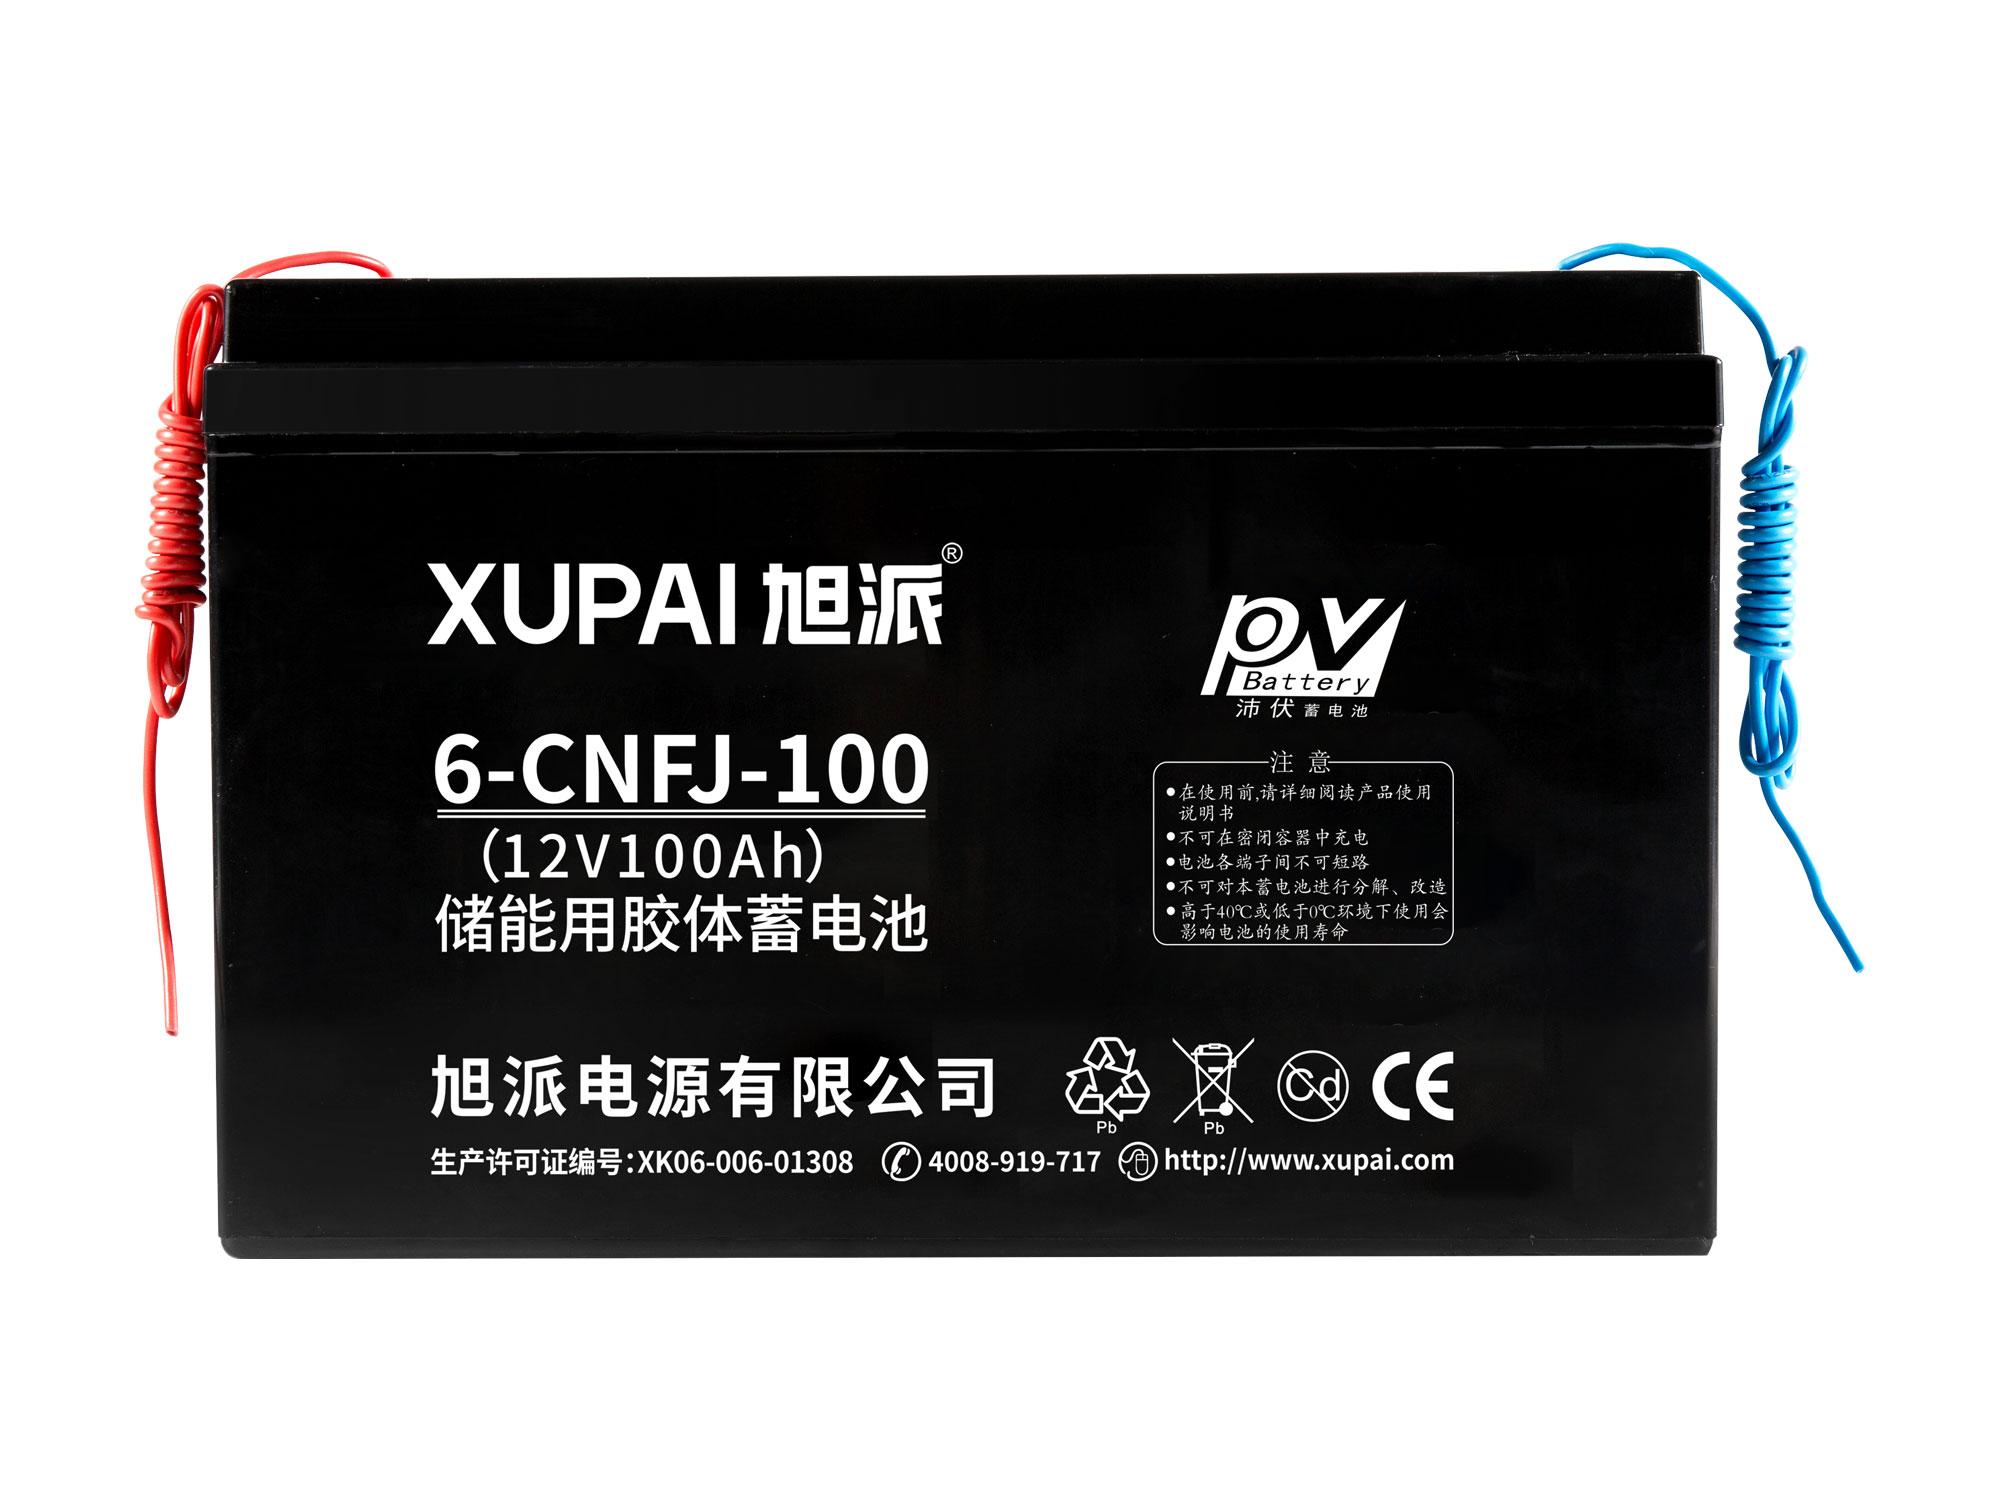 6-cnfj-100储能电池